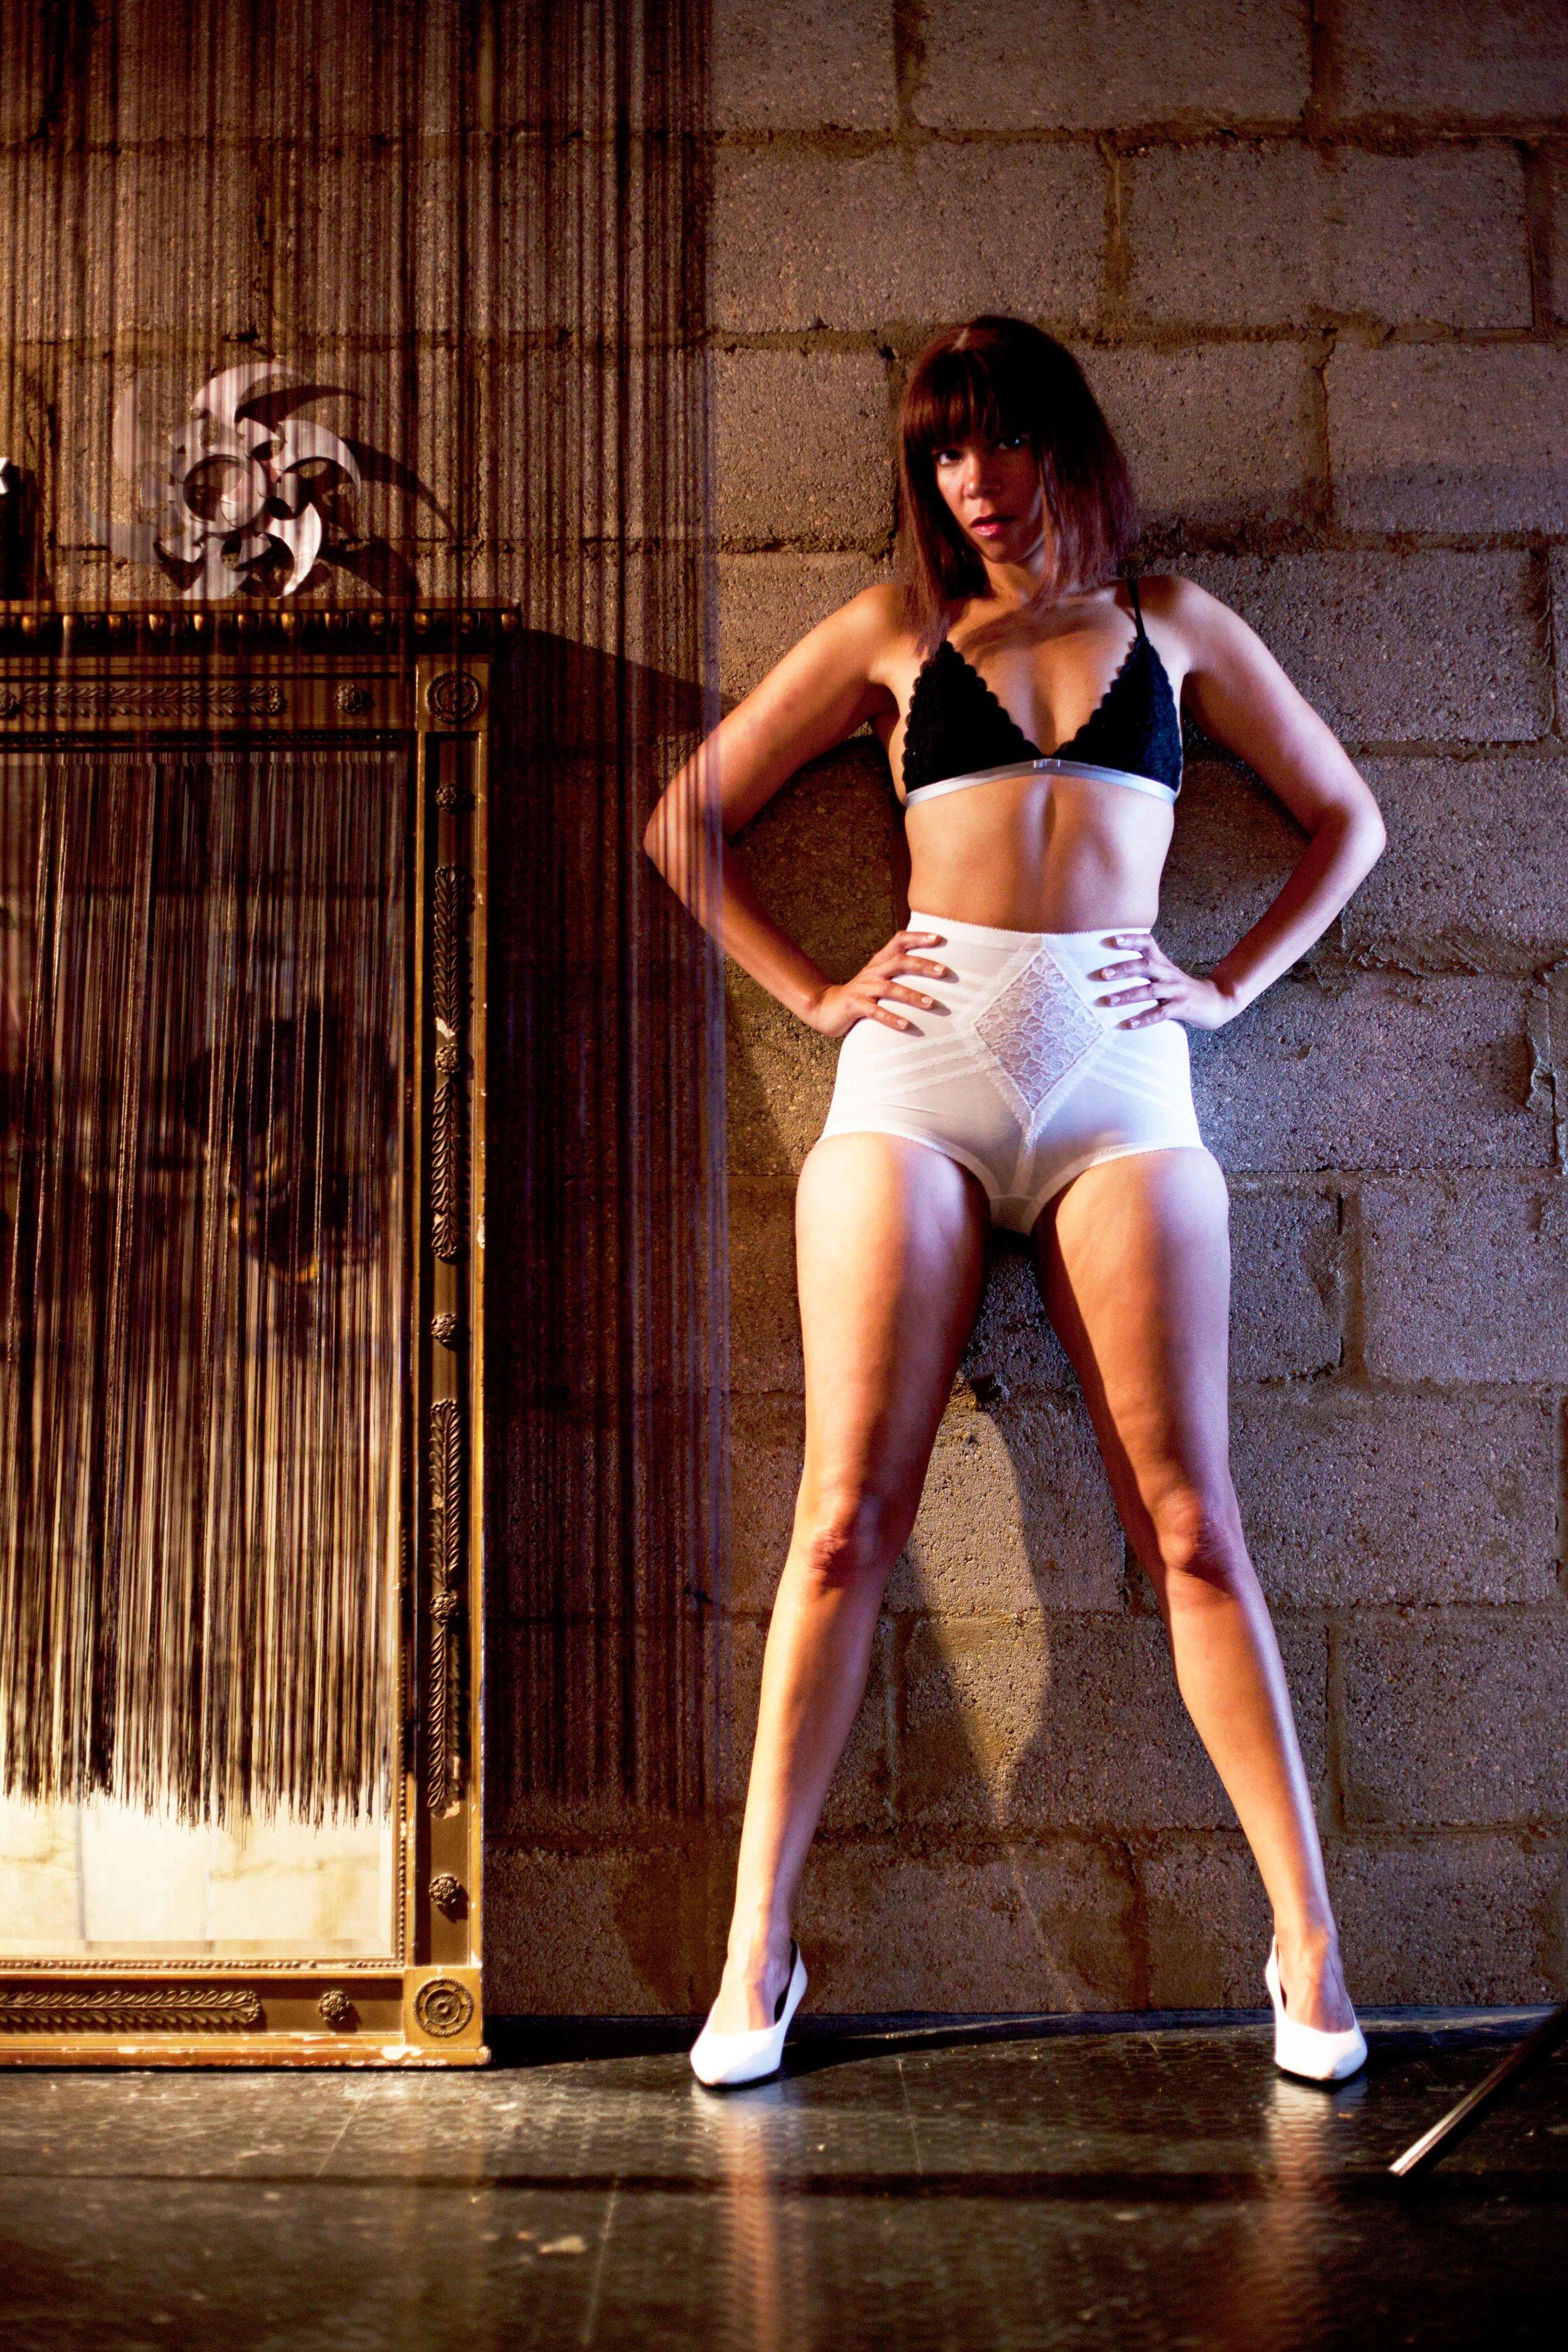 edging-bondage-jerk-off-encouragment--with-femdom-sexy-dominatrix-sesisons-in-london.jpg